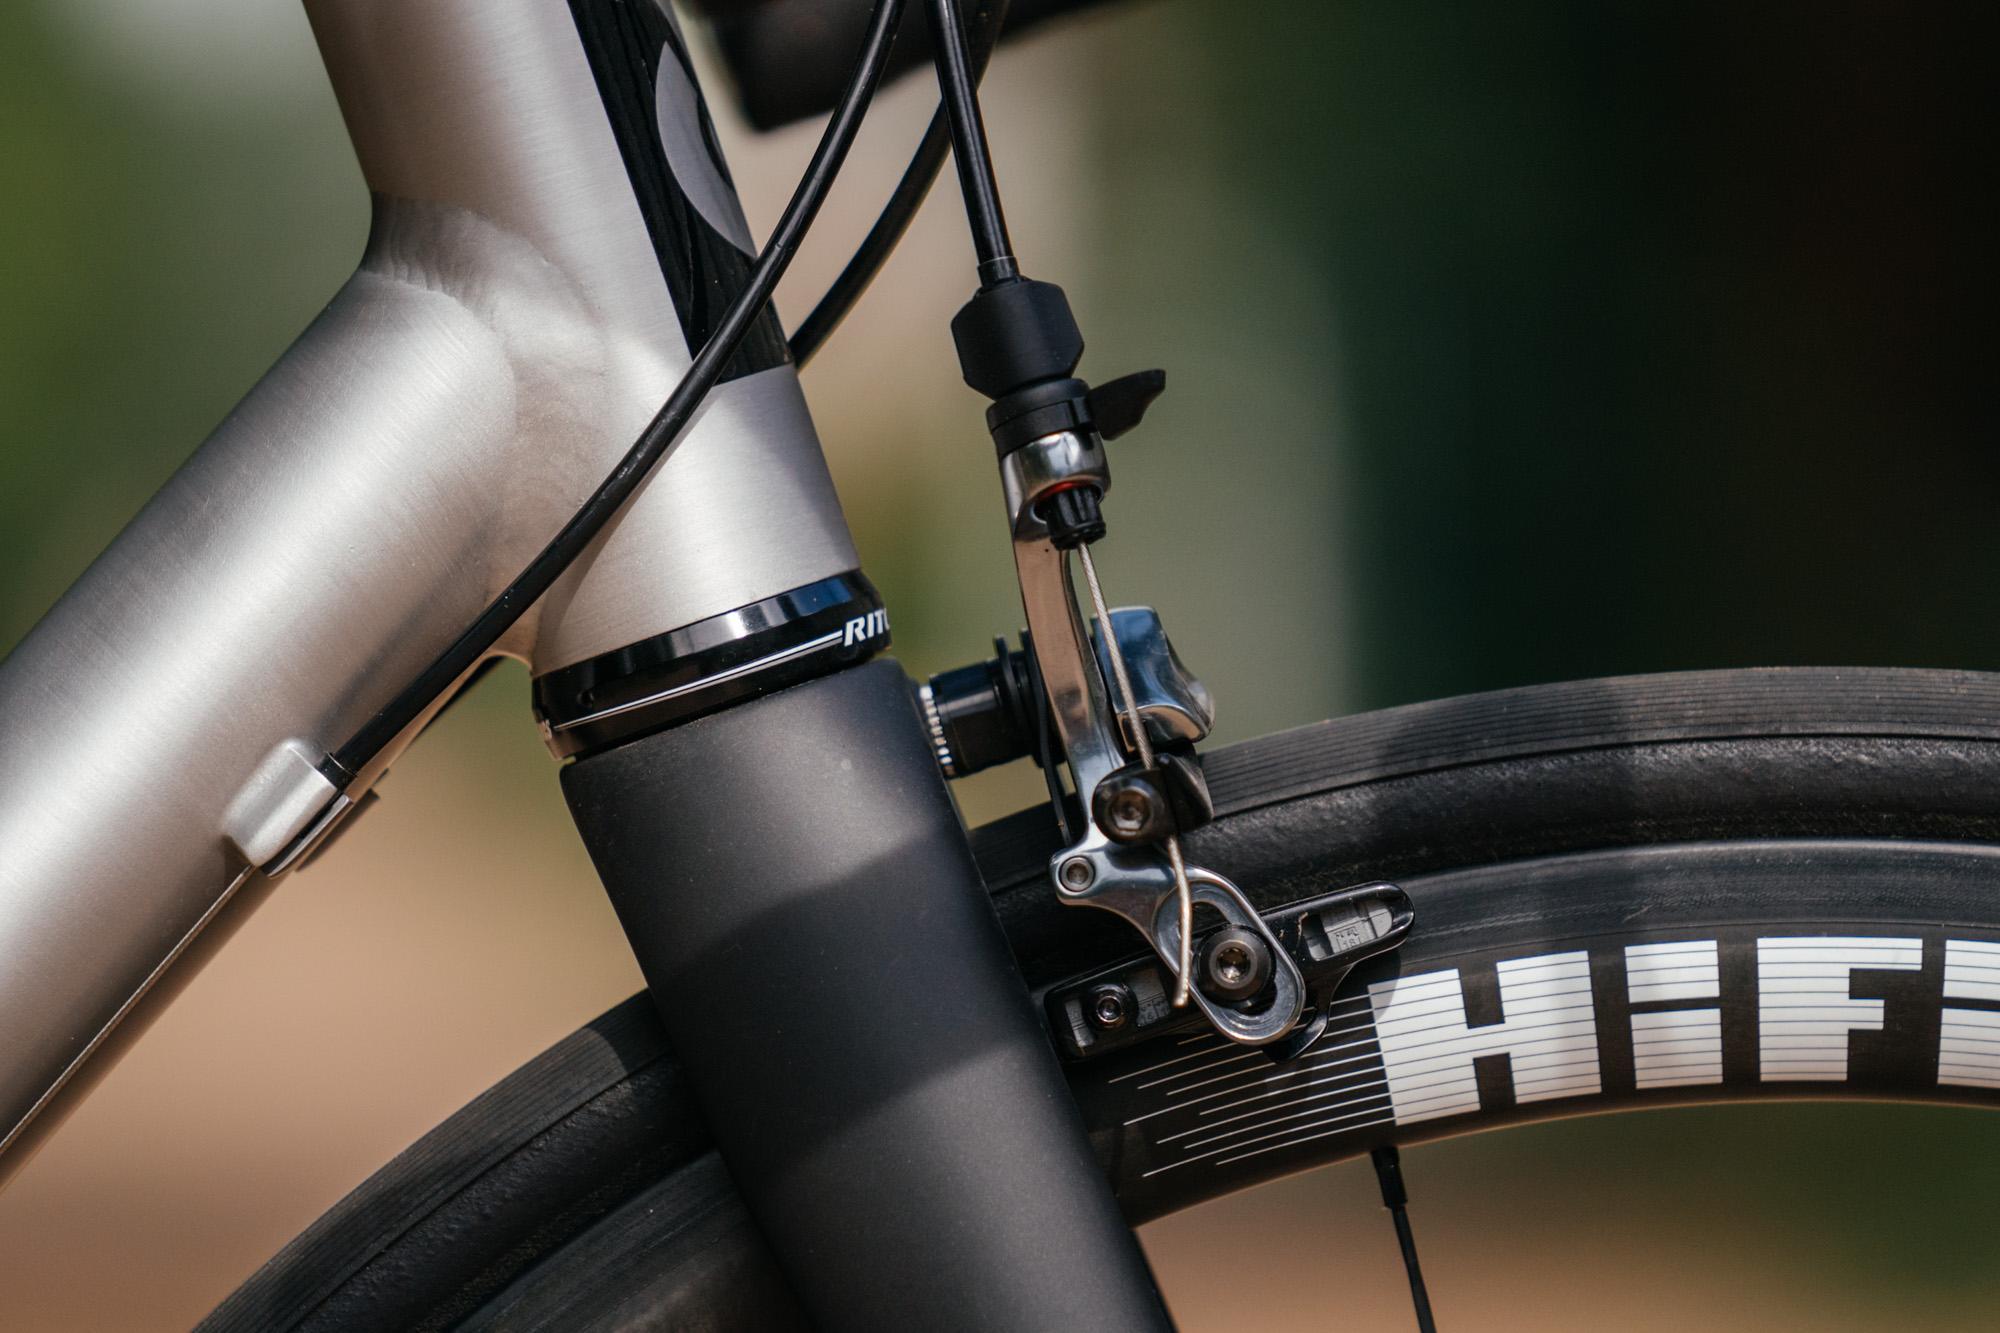 Max's VYNL Bikes /rd rim